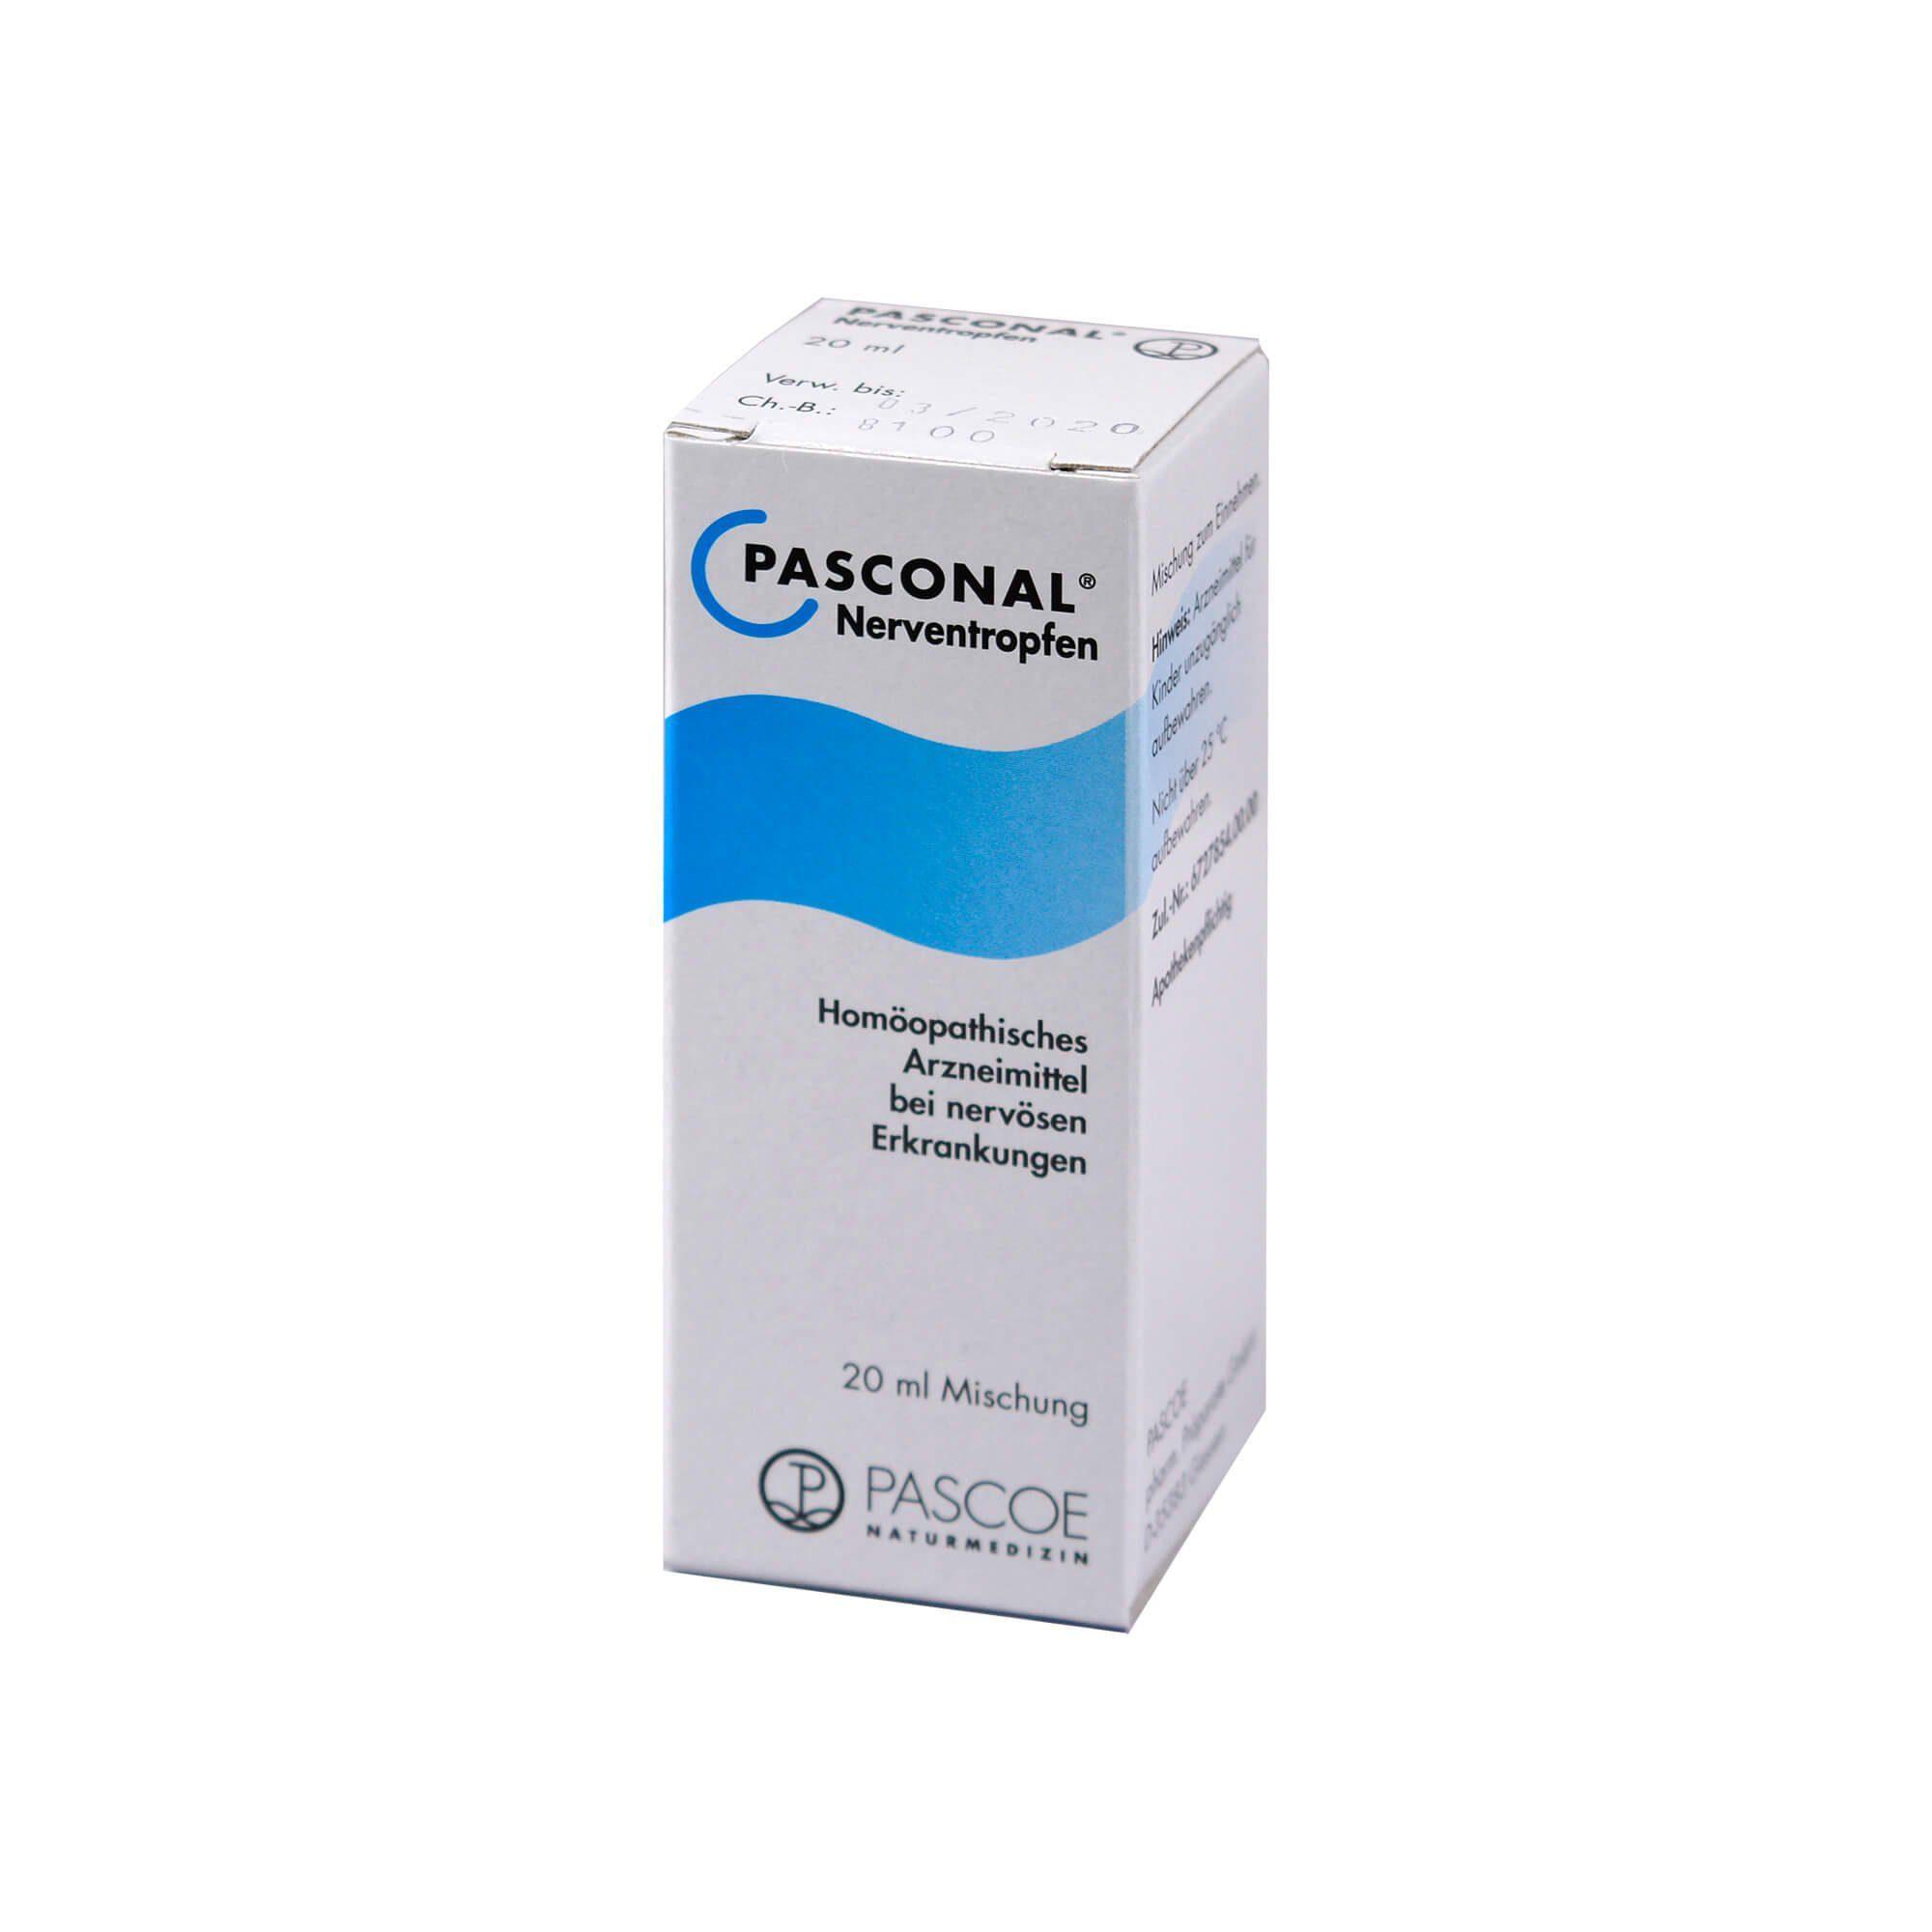 Pasconal, 20 ml